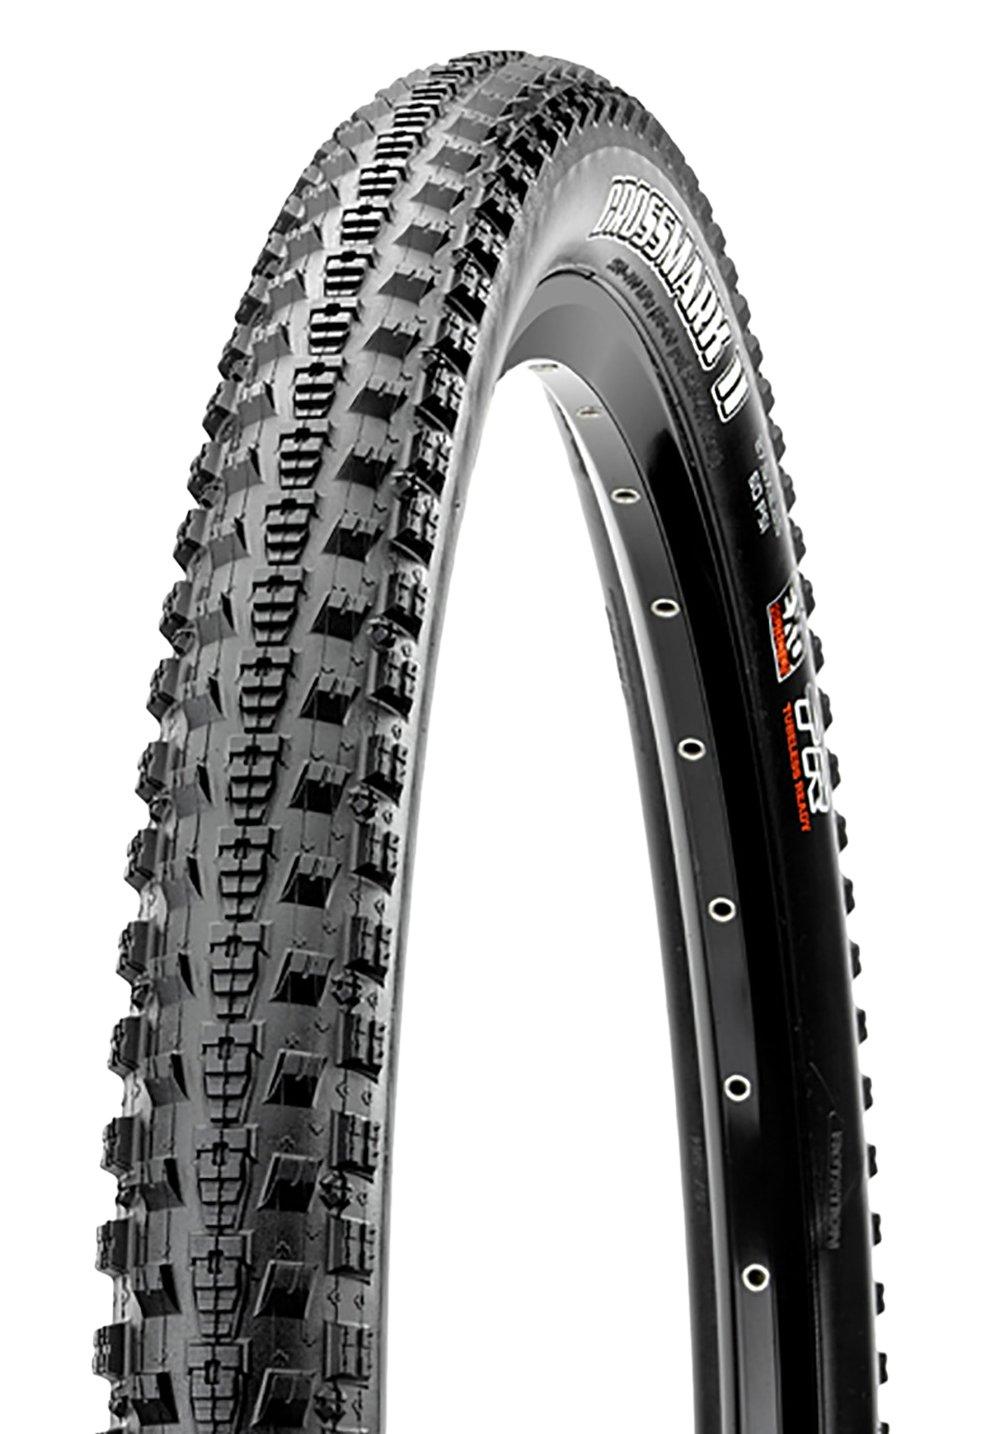 MSC Bikes Crossmark II Exo Kv Neumático, Negro, 27.5 x 2.10 product image